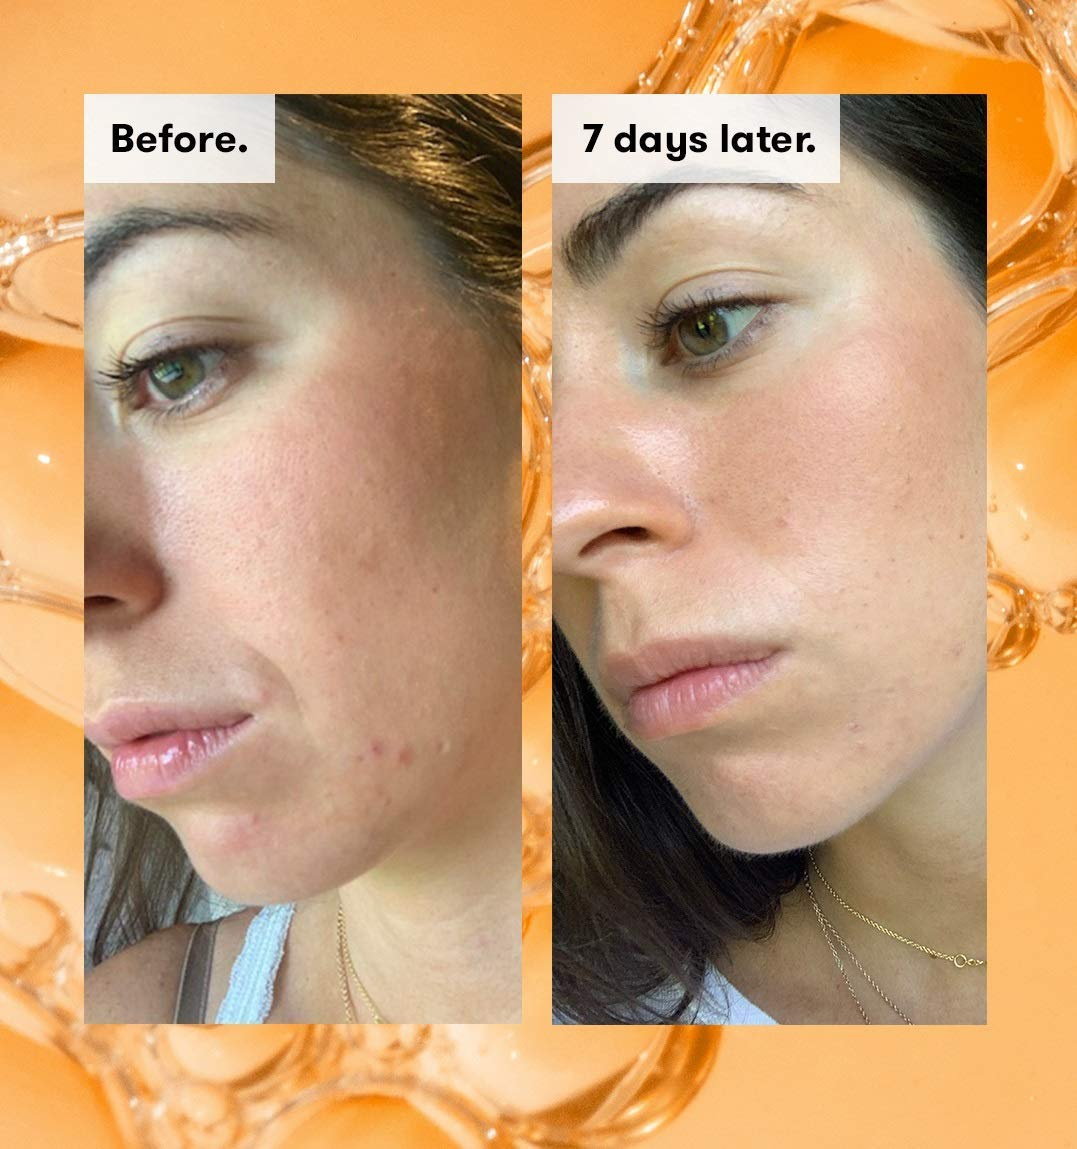 REN Clean Skincare(レンクリーンスキンケア) レディー ステディー グロー デイリー AHA トニックの商品画像3